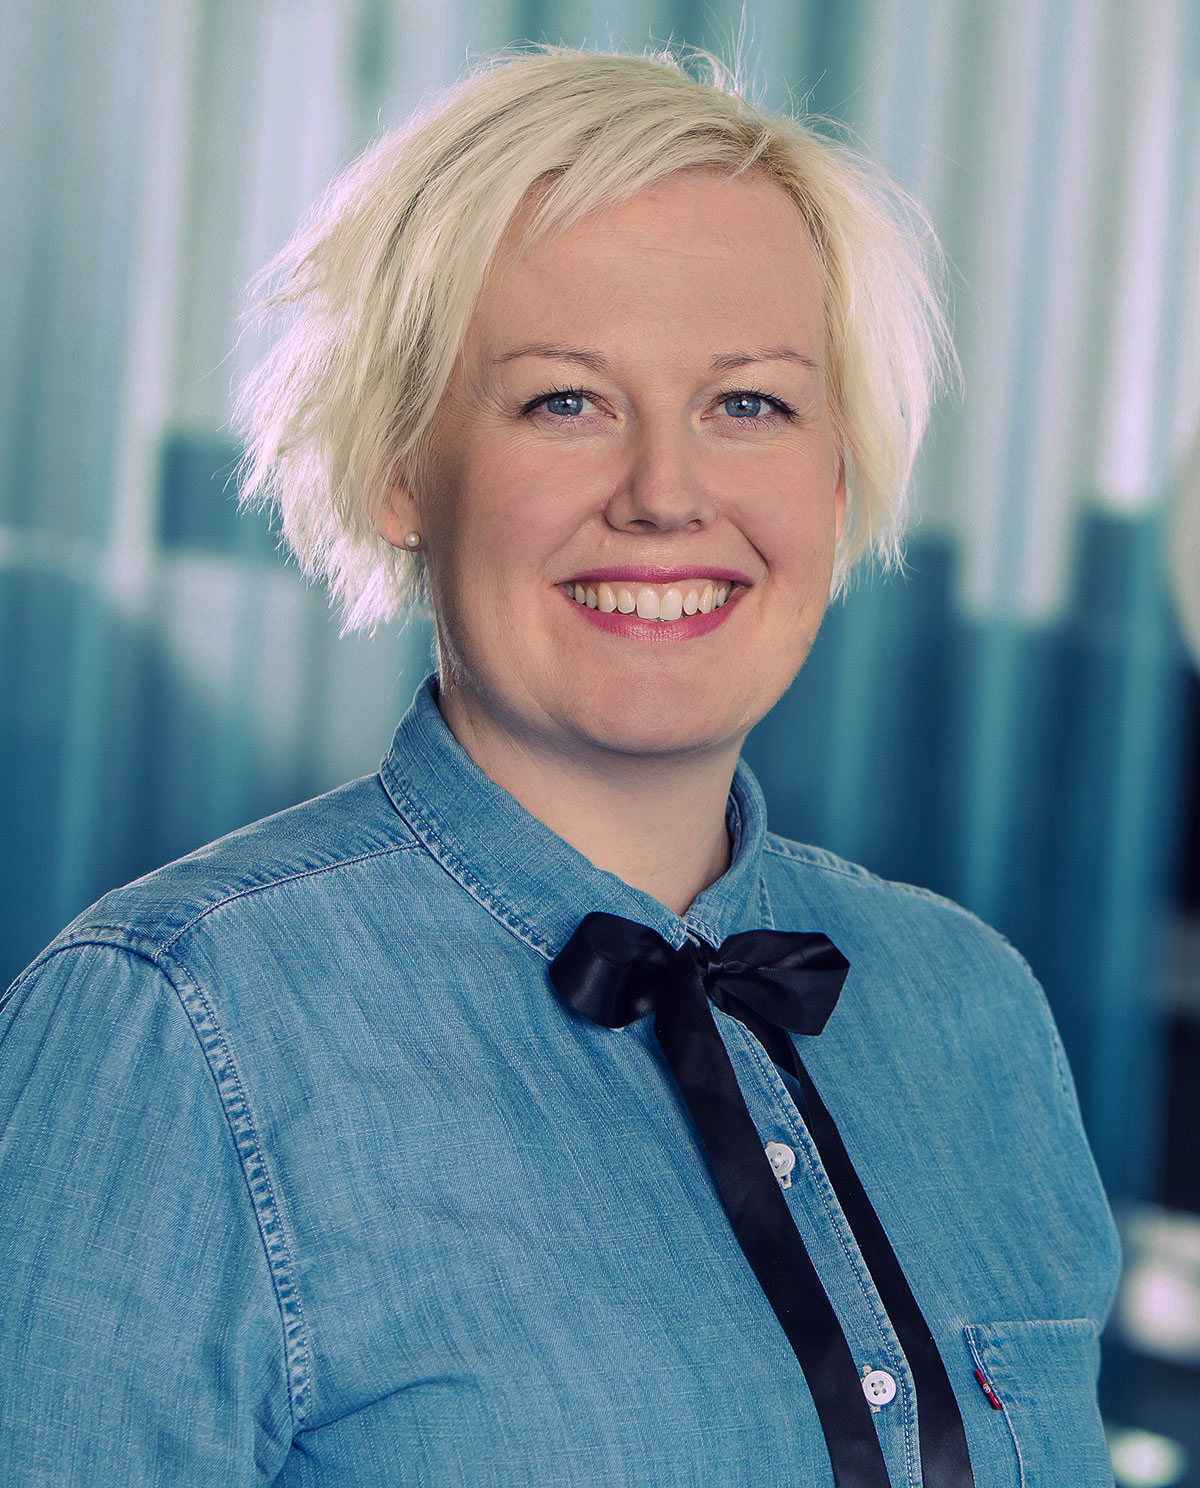 Marie Lekmark